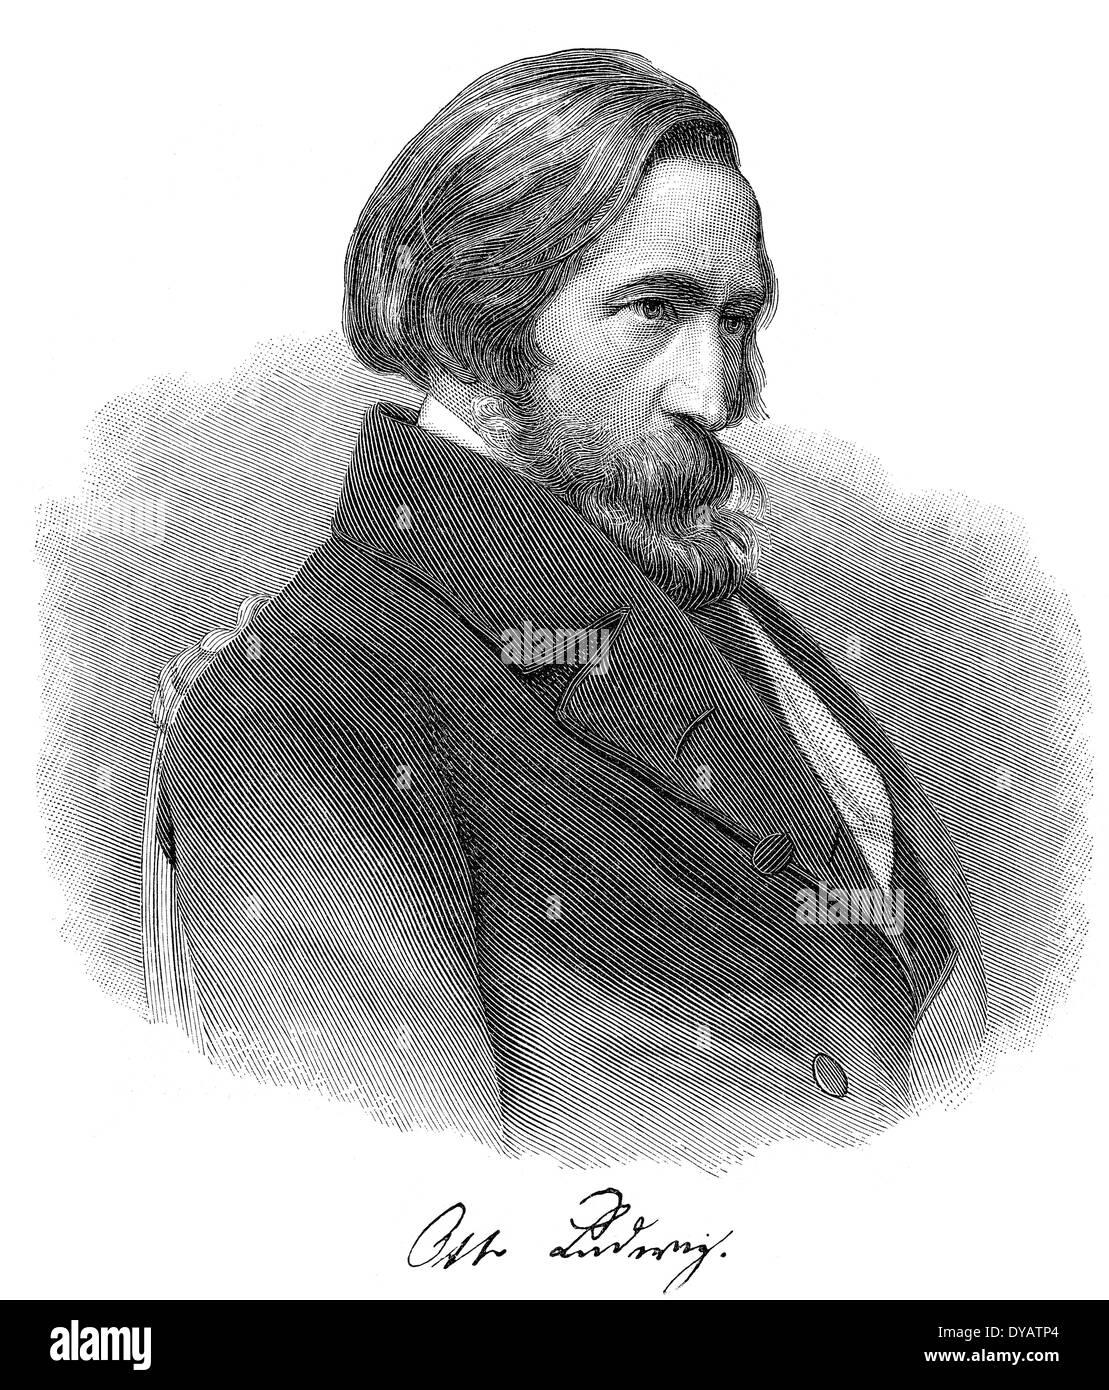 Otto Ludwig, 1813 - 1865, a German dramatist, novelist and critic - Stock Image